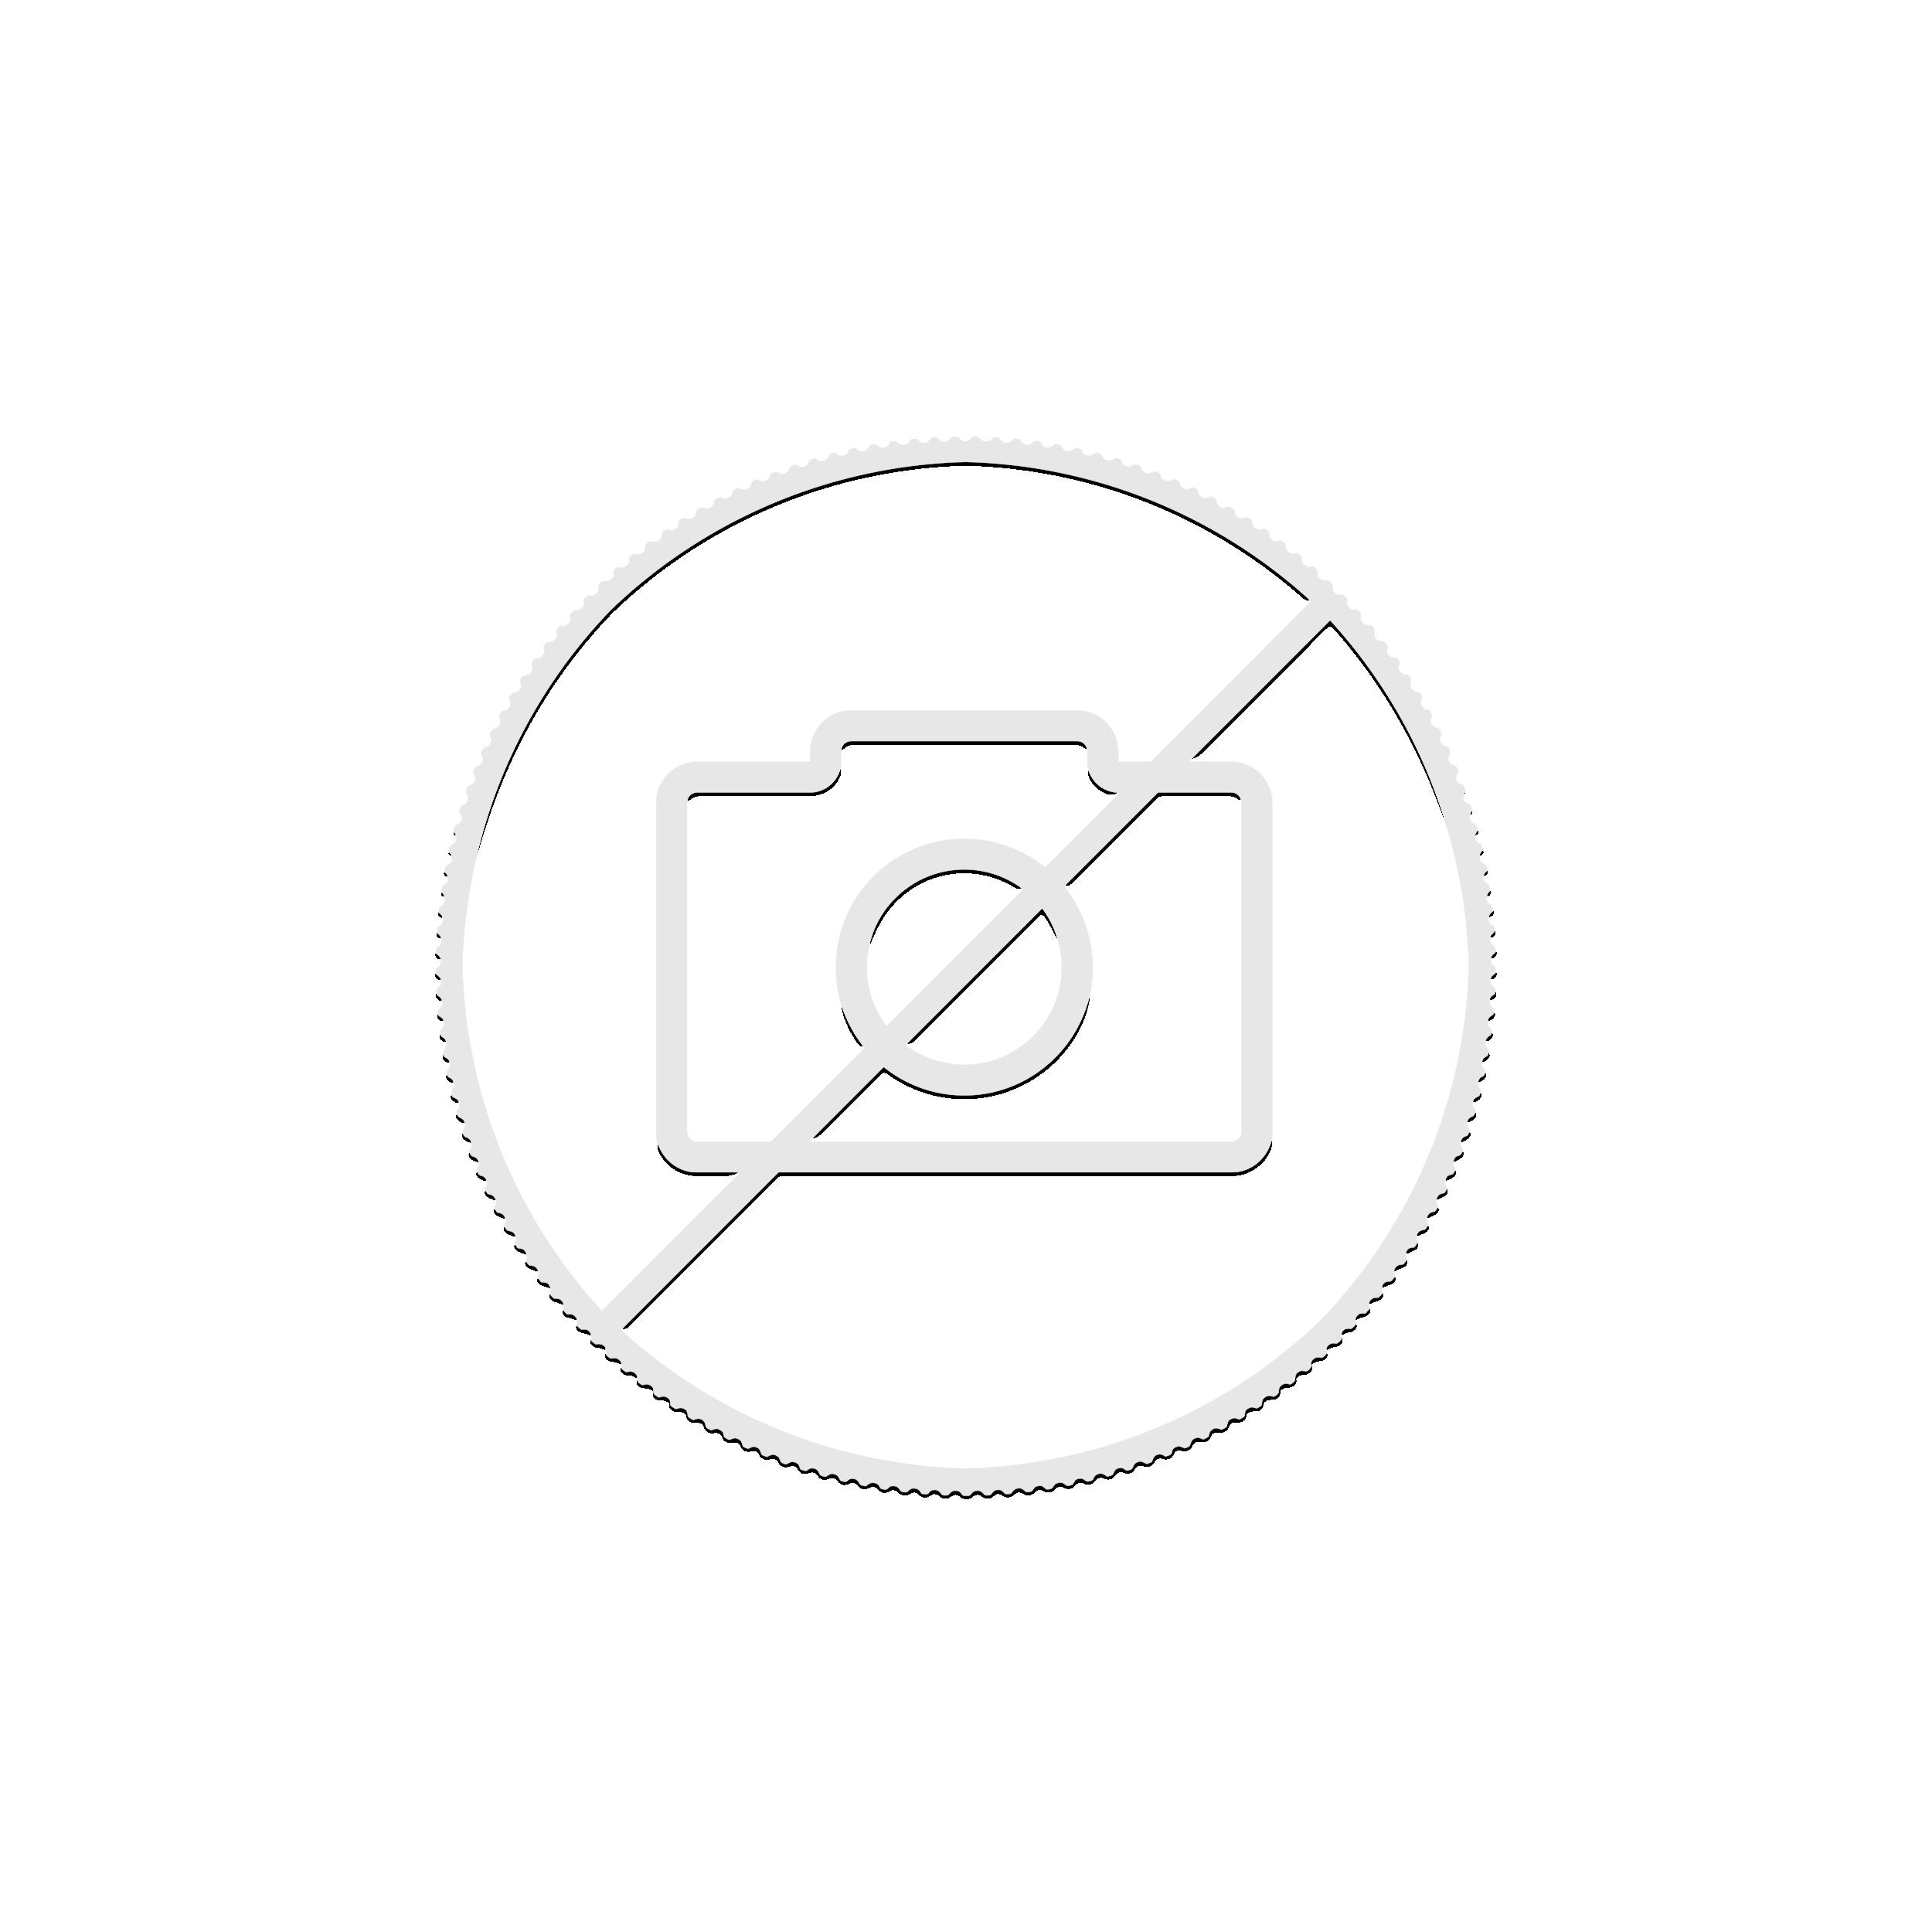 1 troy ounce silver coin Diwali 2021